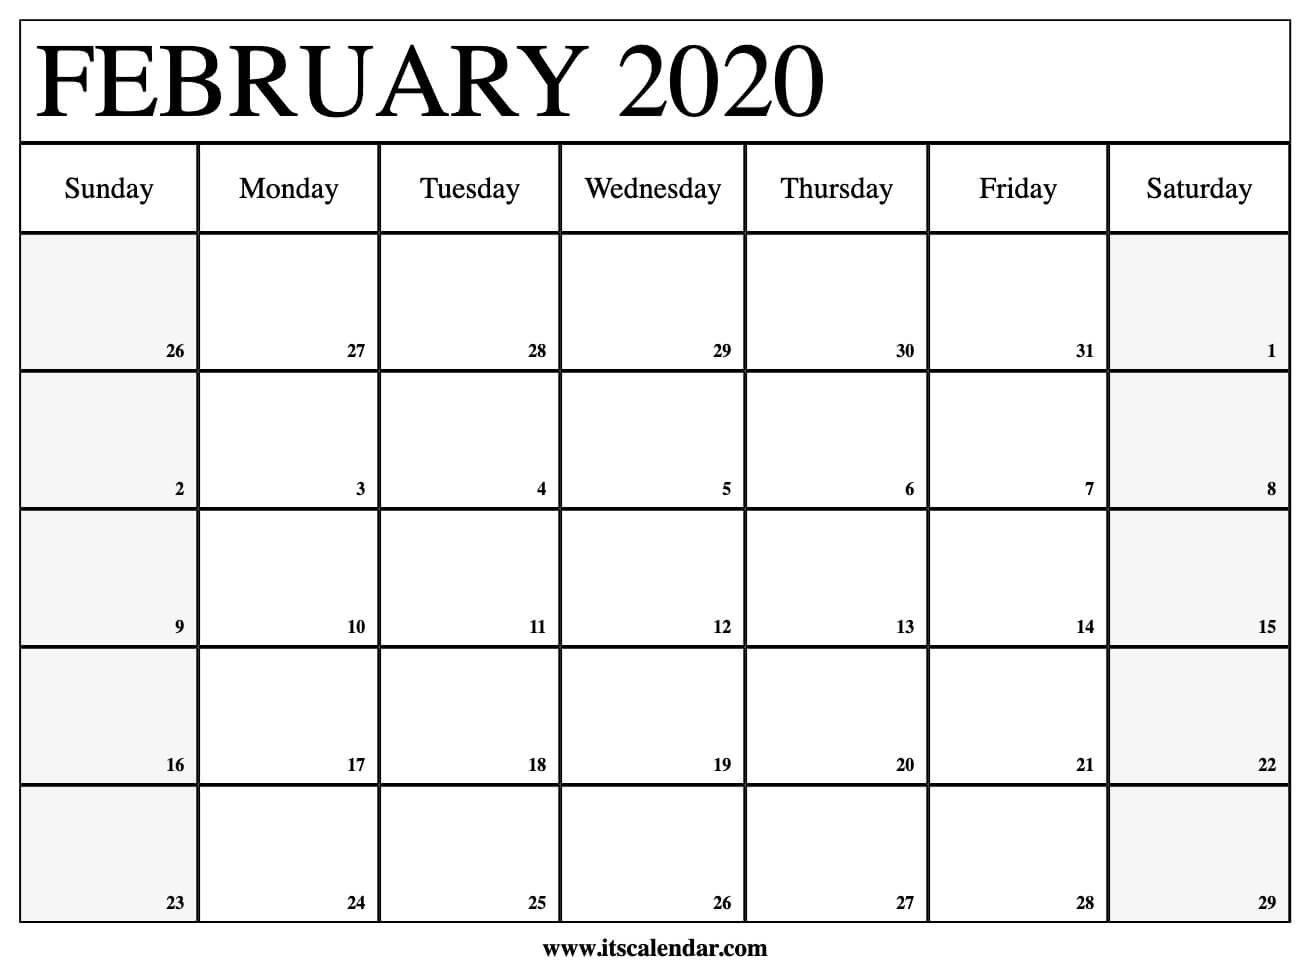 Free Printable February 2020 Calendar Printable Month Calendar With Times